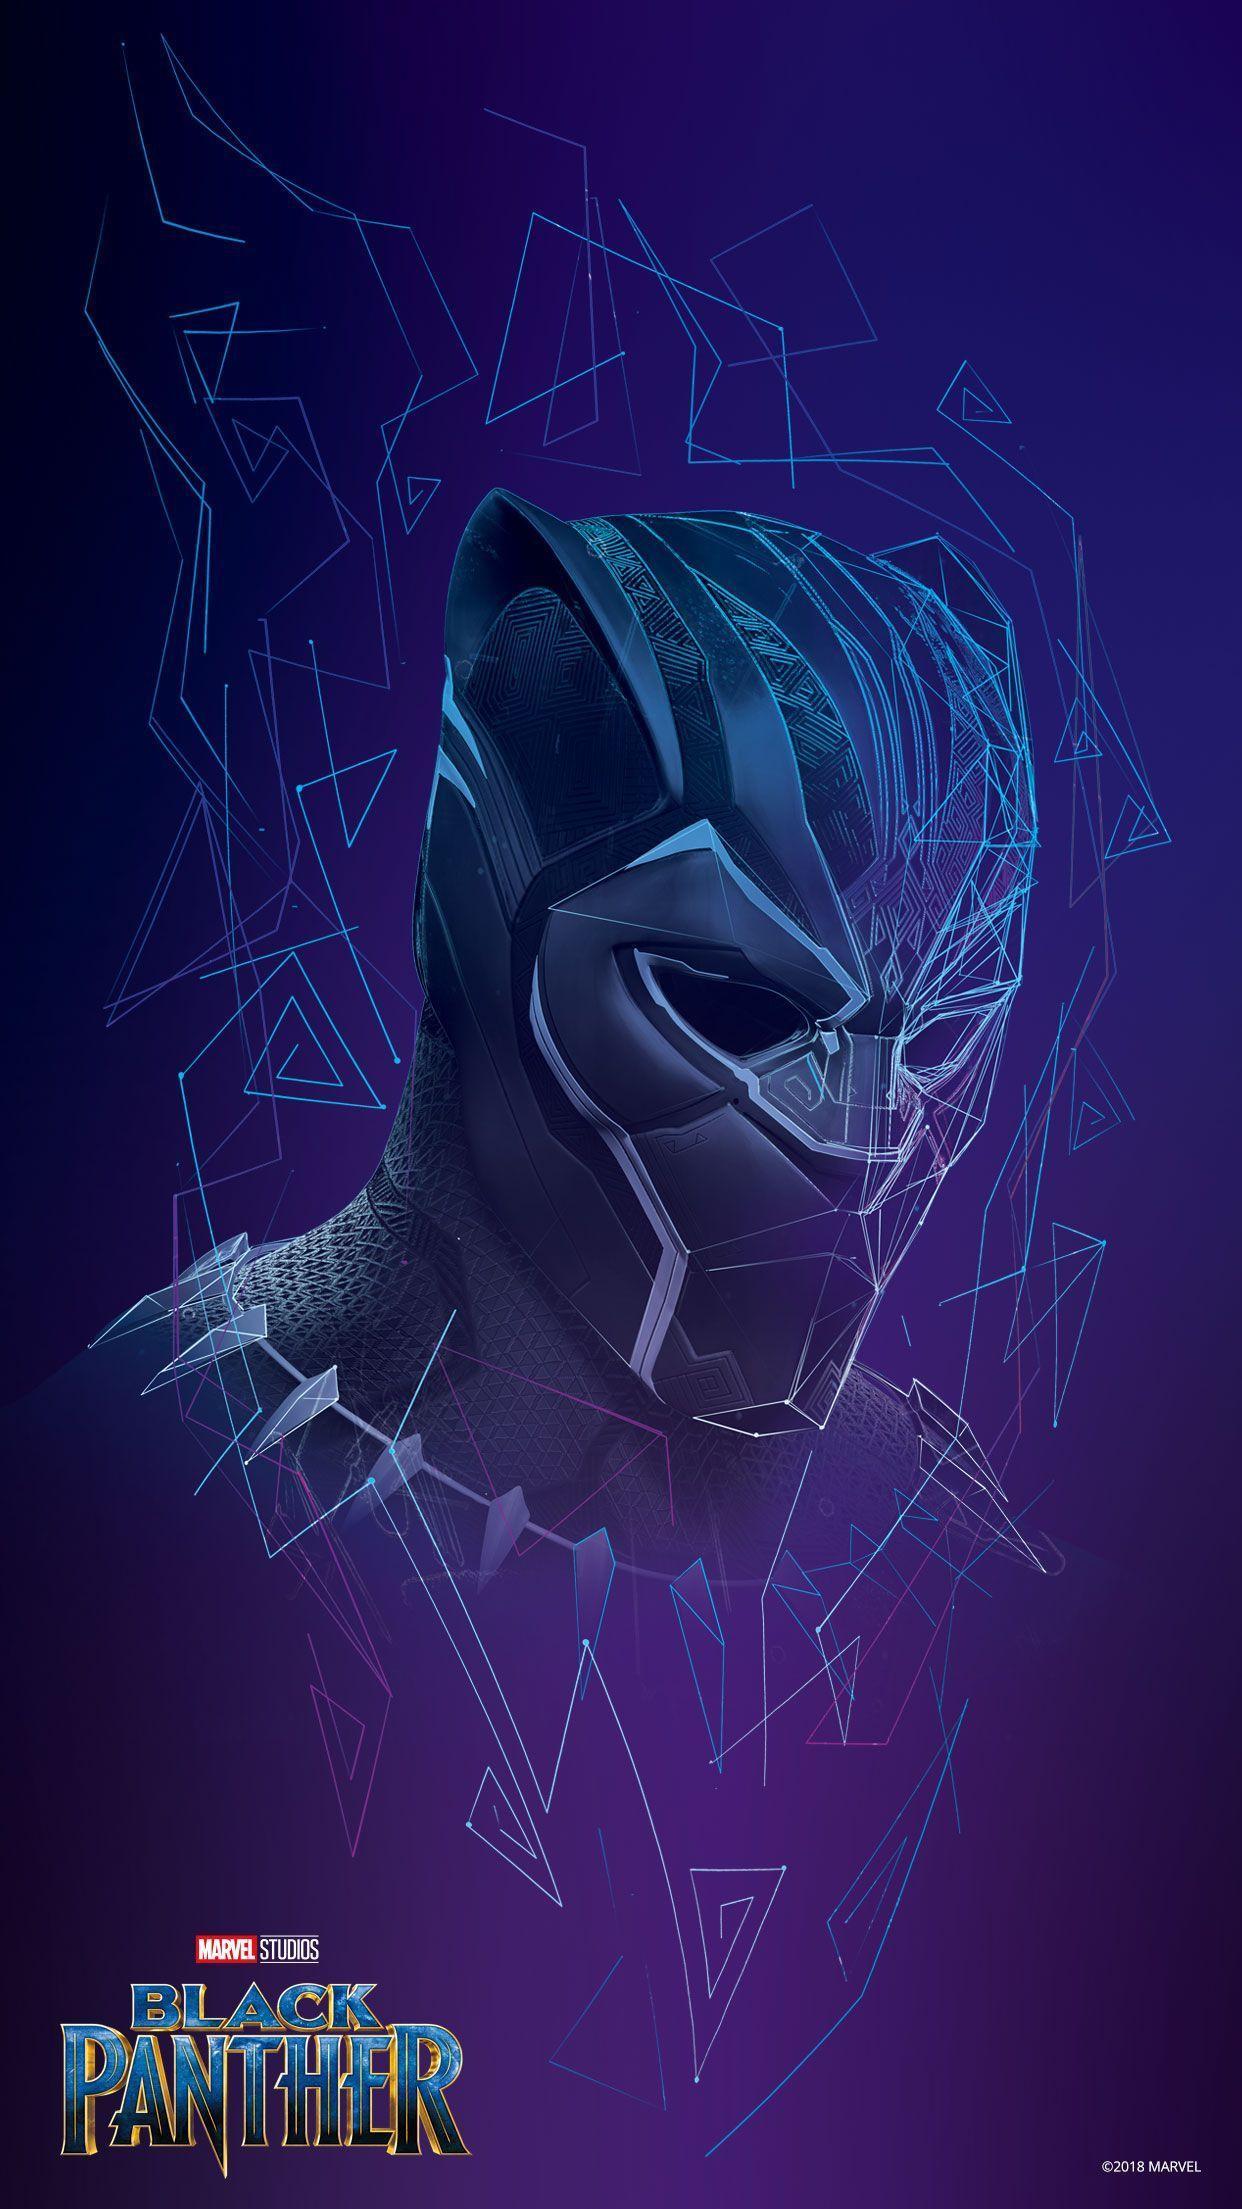 Wakanda Black Panther Wallpapers Top Free Wakanda Black Panther Backgrounds Wallpaperaccess